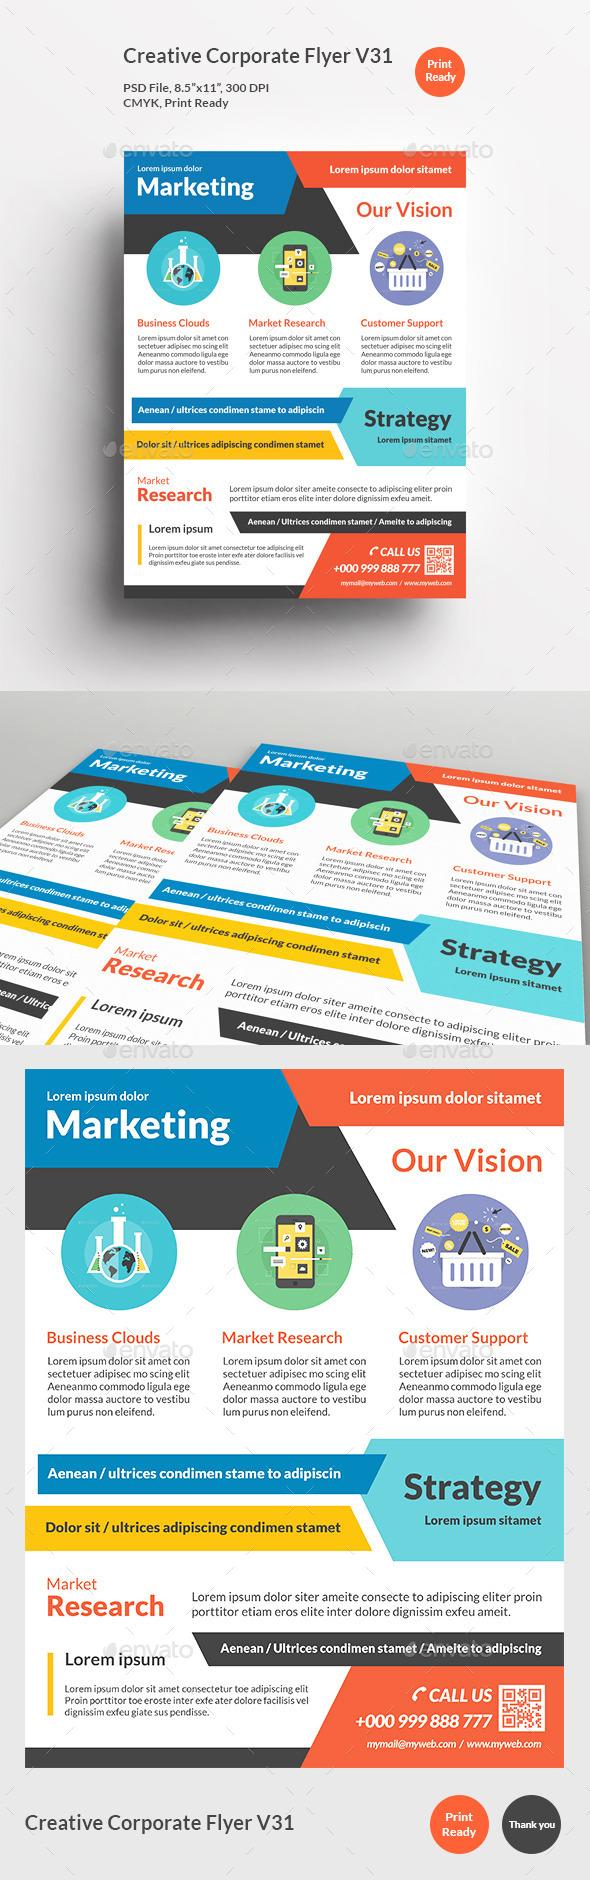 Creative Corporate Flyer V31